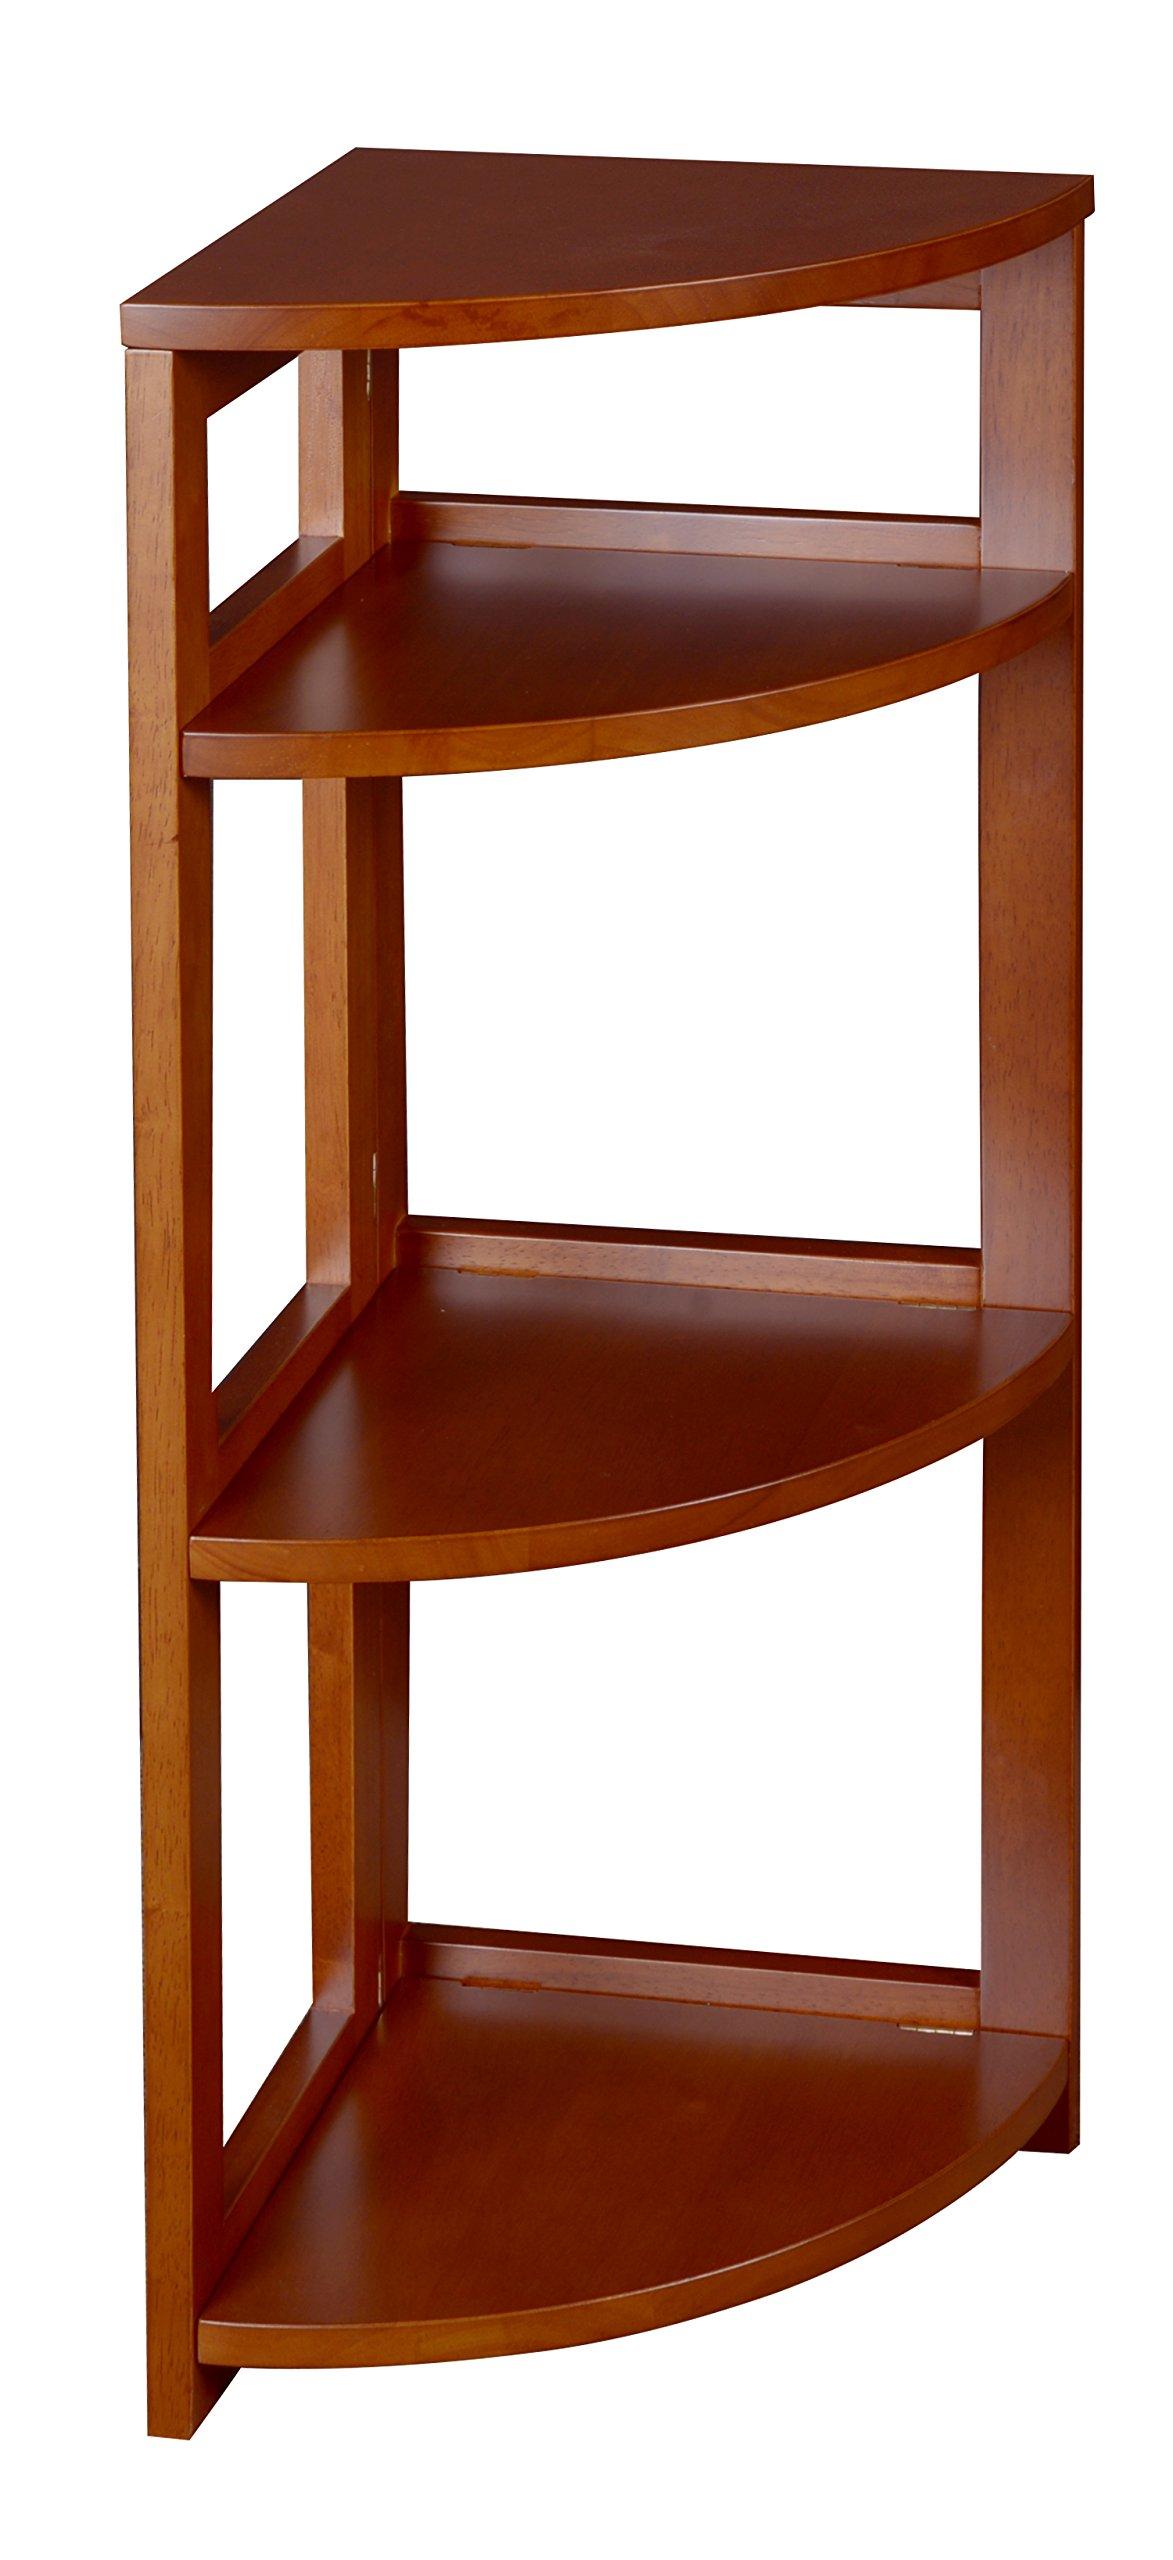 Regency Flip Flop 34-inch High Corner Folding Bookcase- Cherry